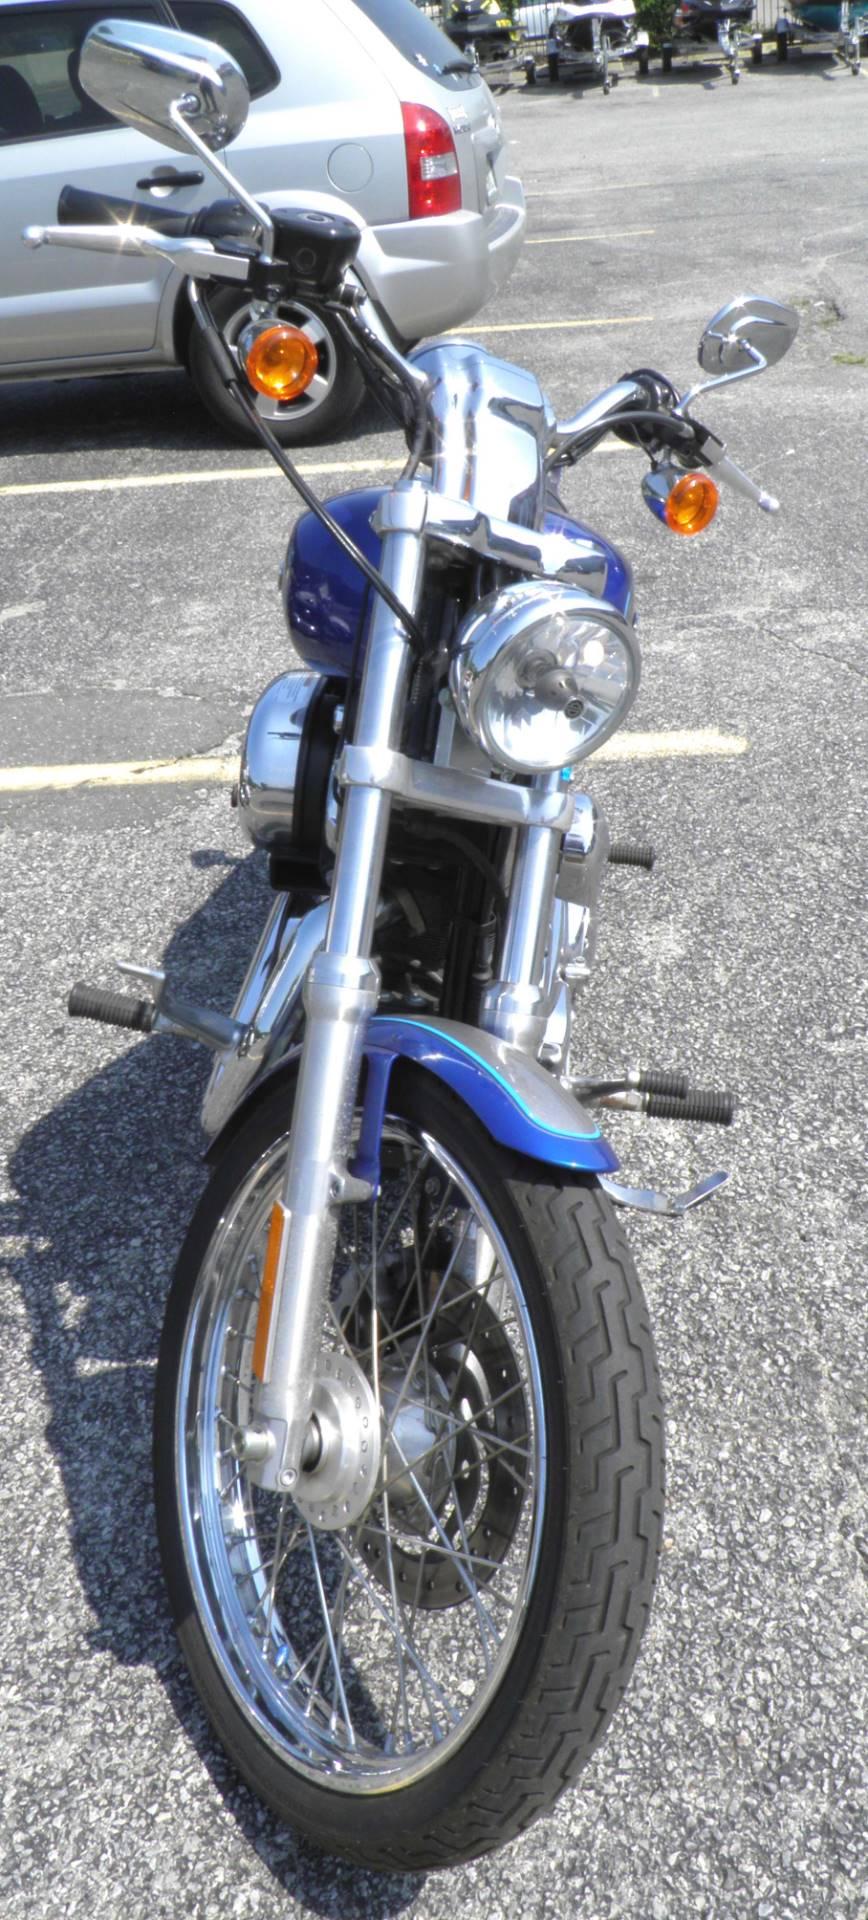 2009 Harley-Davidson Sportster 1200 Custom 4